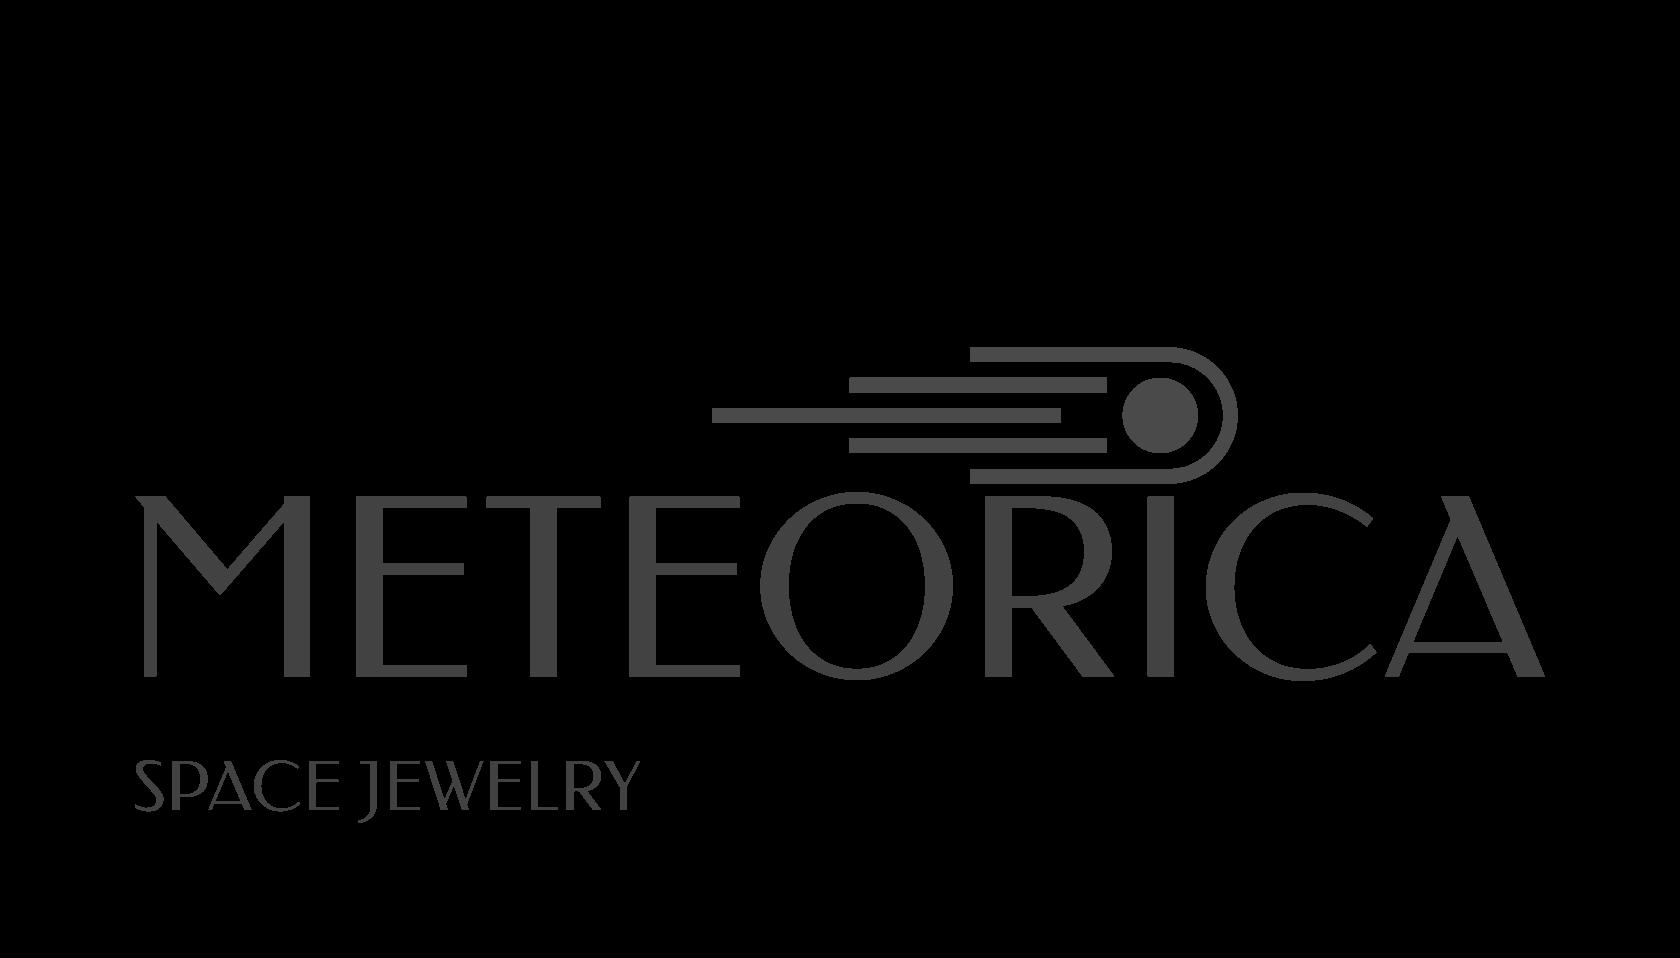 Meteorica